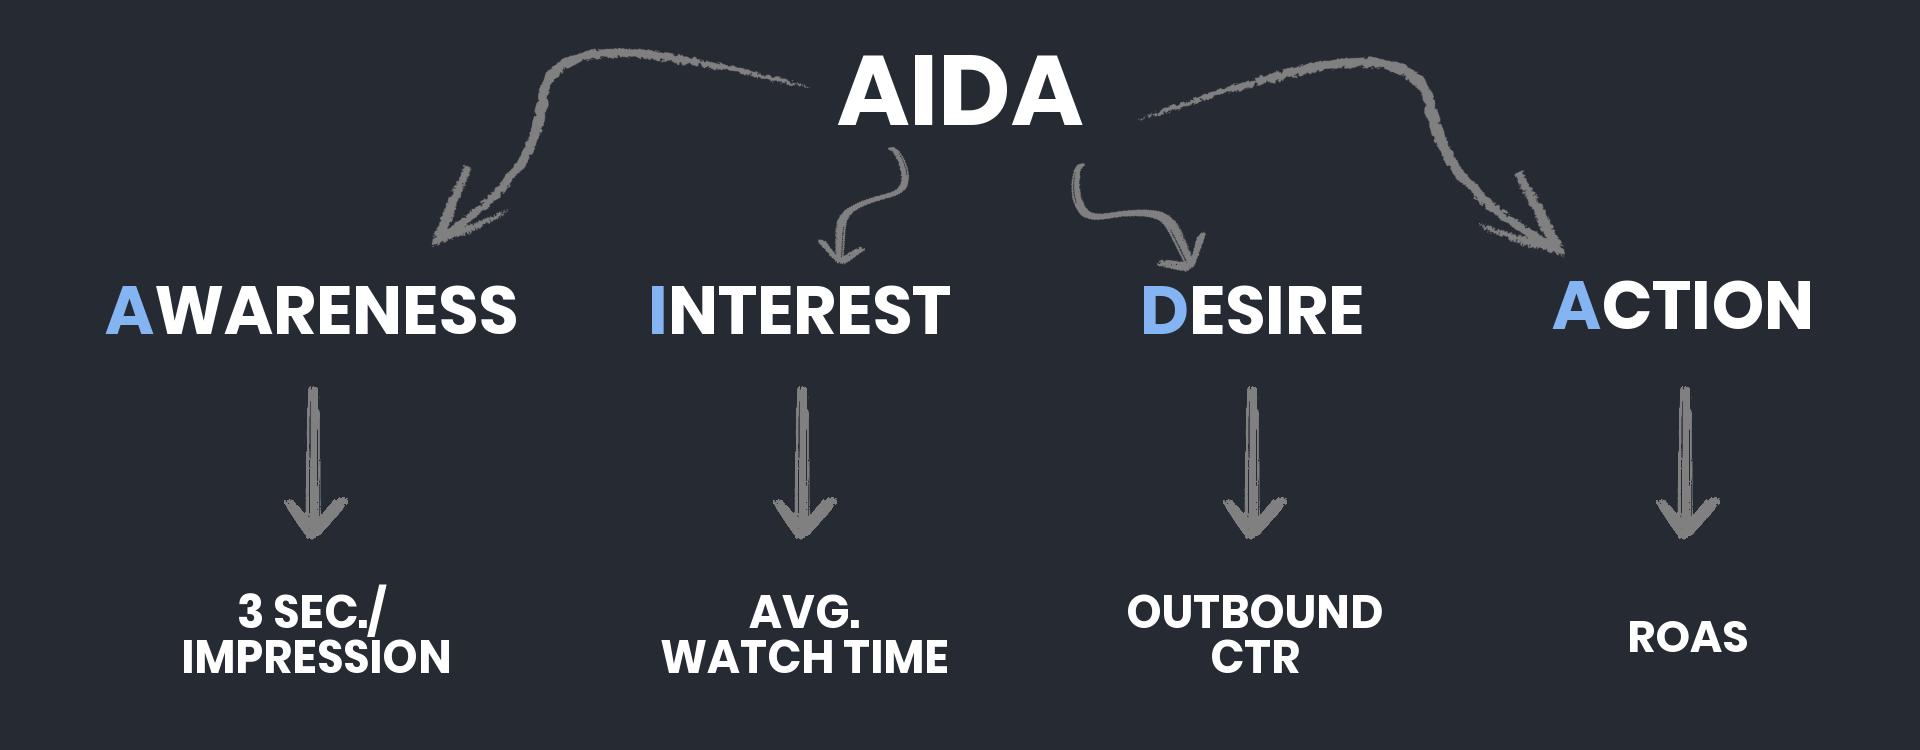 aida-creative-formula-by-victory-media